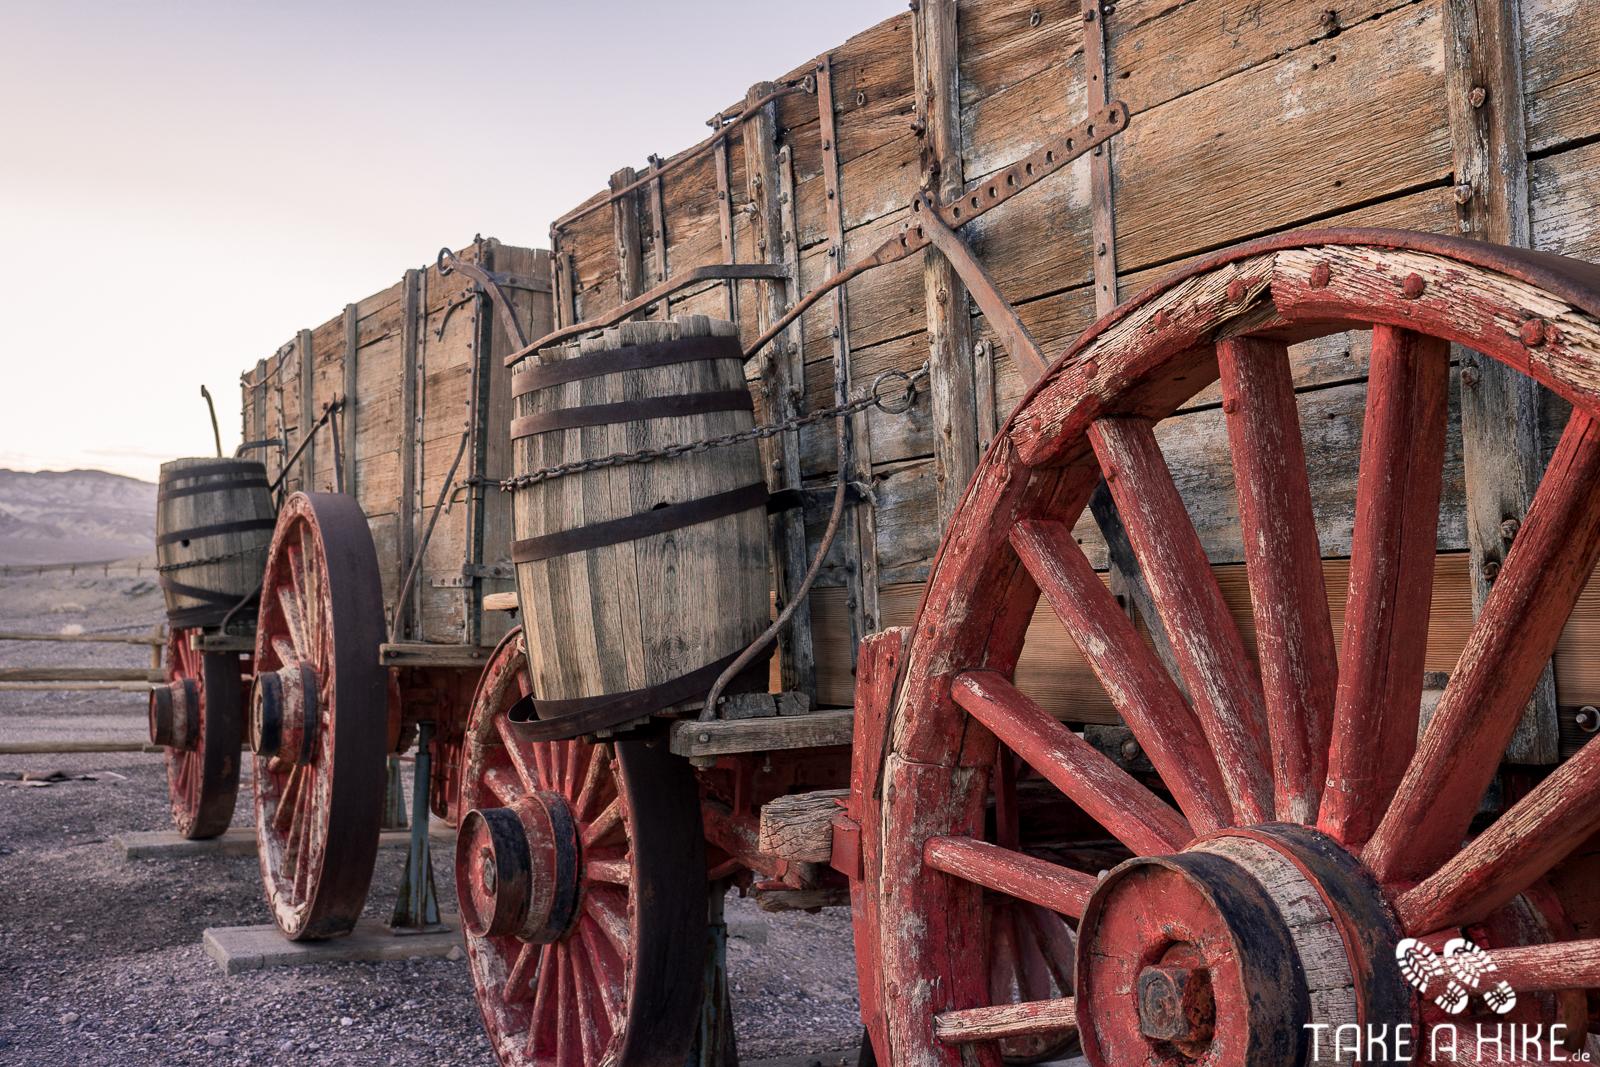 Harmony Borax 20 Mule Team Wagon